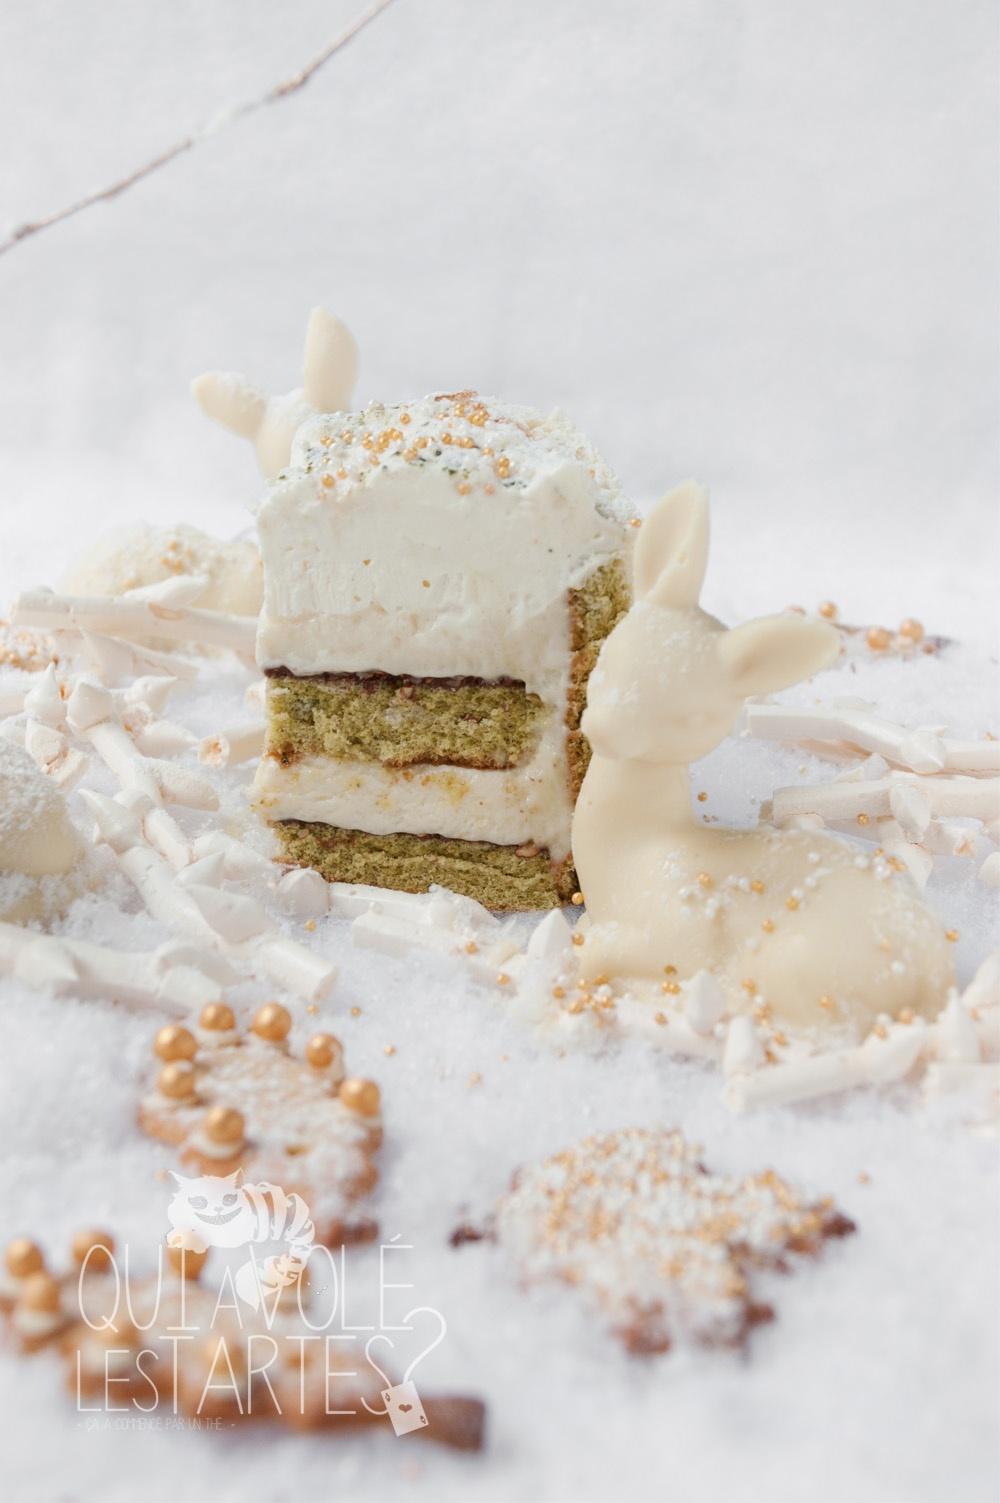 Nara 4 - charlotte sans gluten MatchaYuzu - Studio 2 créaion - Qui a volé les tartes